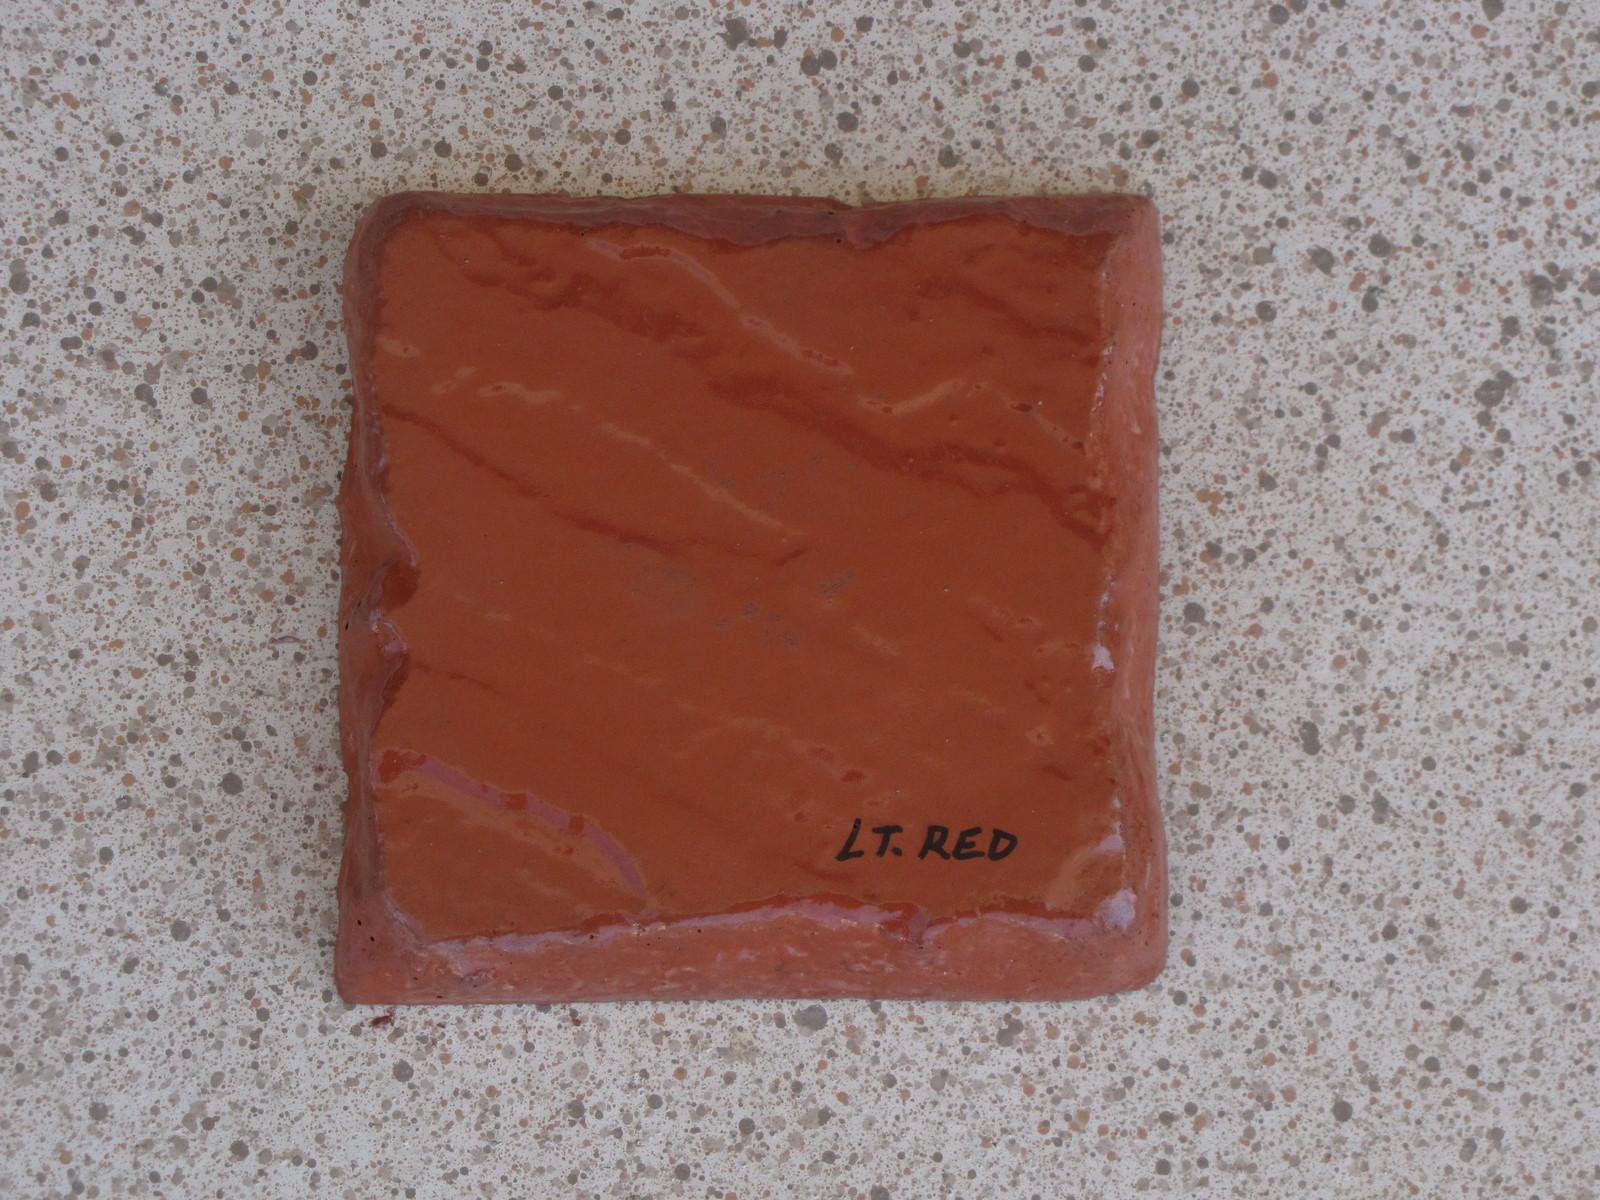 1 LB. LIGHT RED POWDER TO COLOR CONCRETE, CEMENT, PLASTER, GROUT, BRICK VENEER